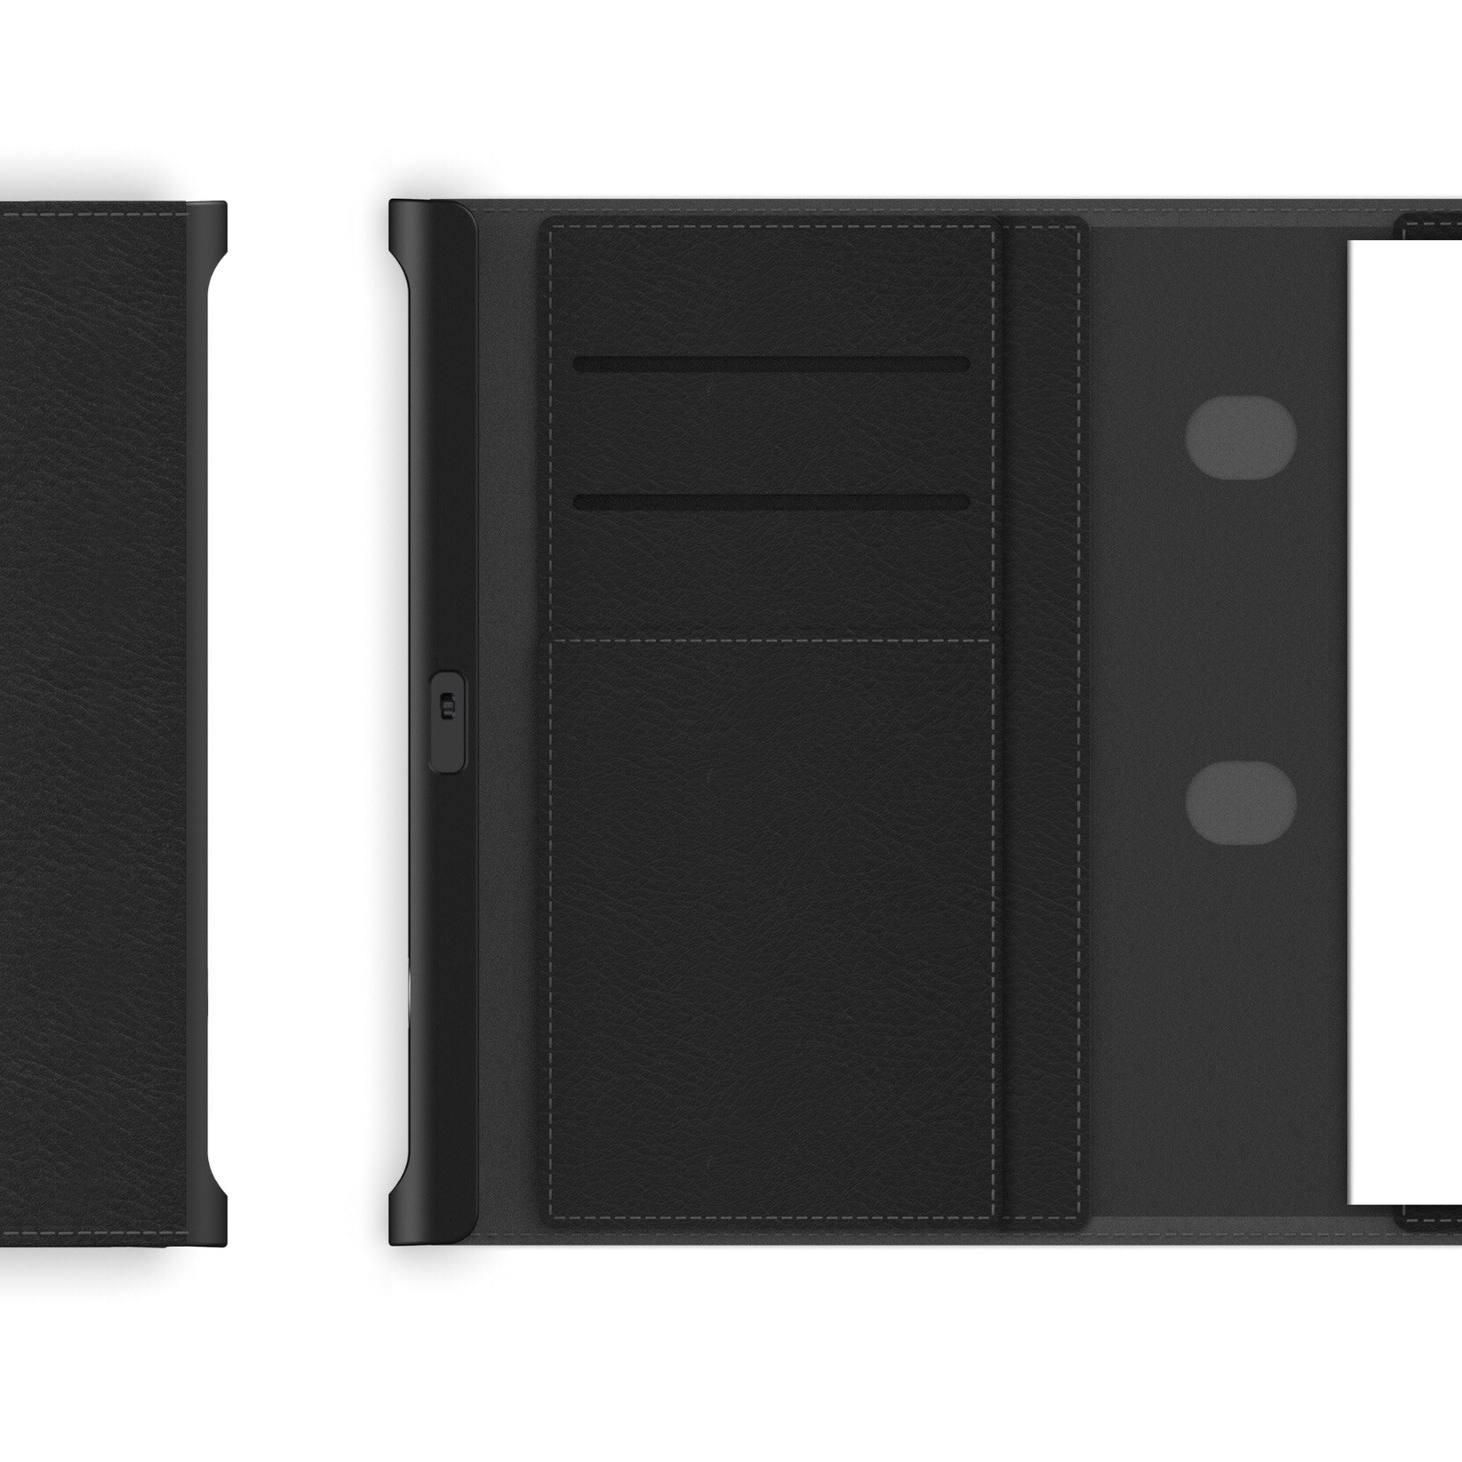 Smartbook with fingerprint reader | Midas Touch